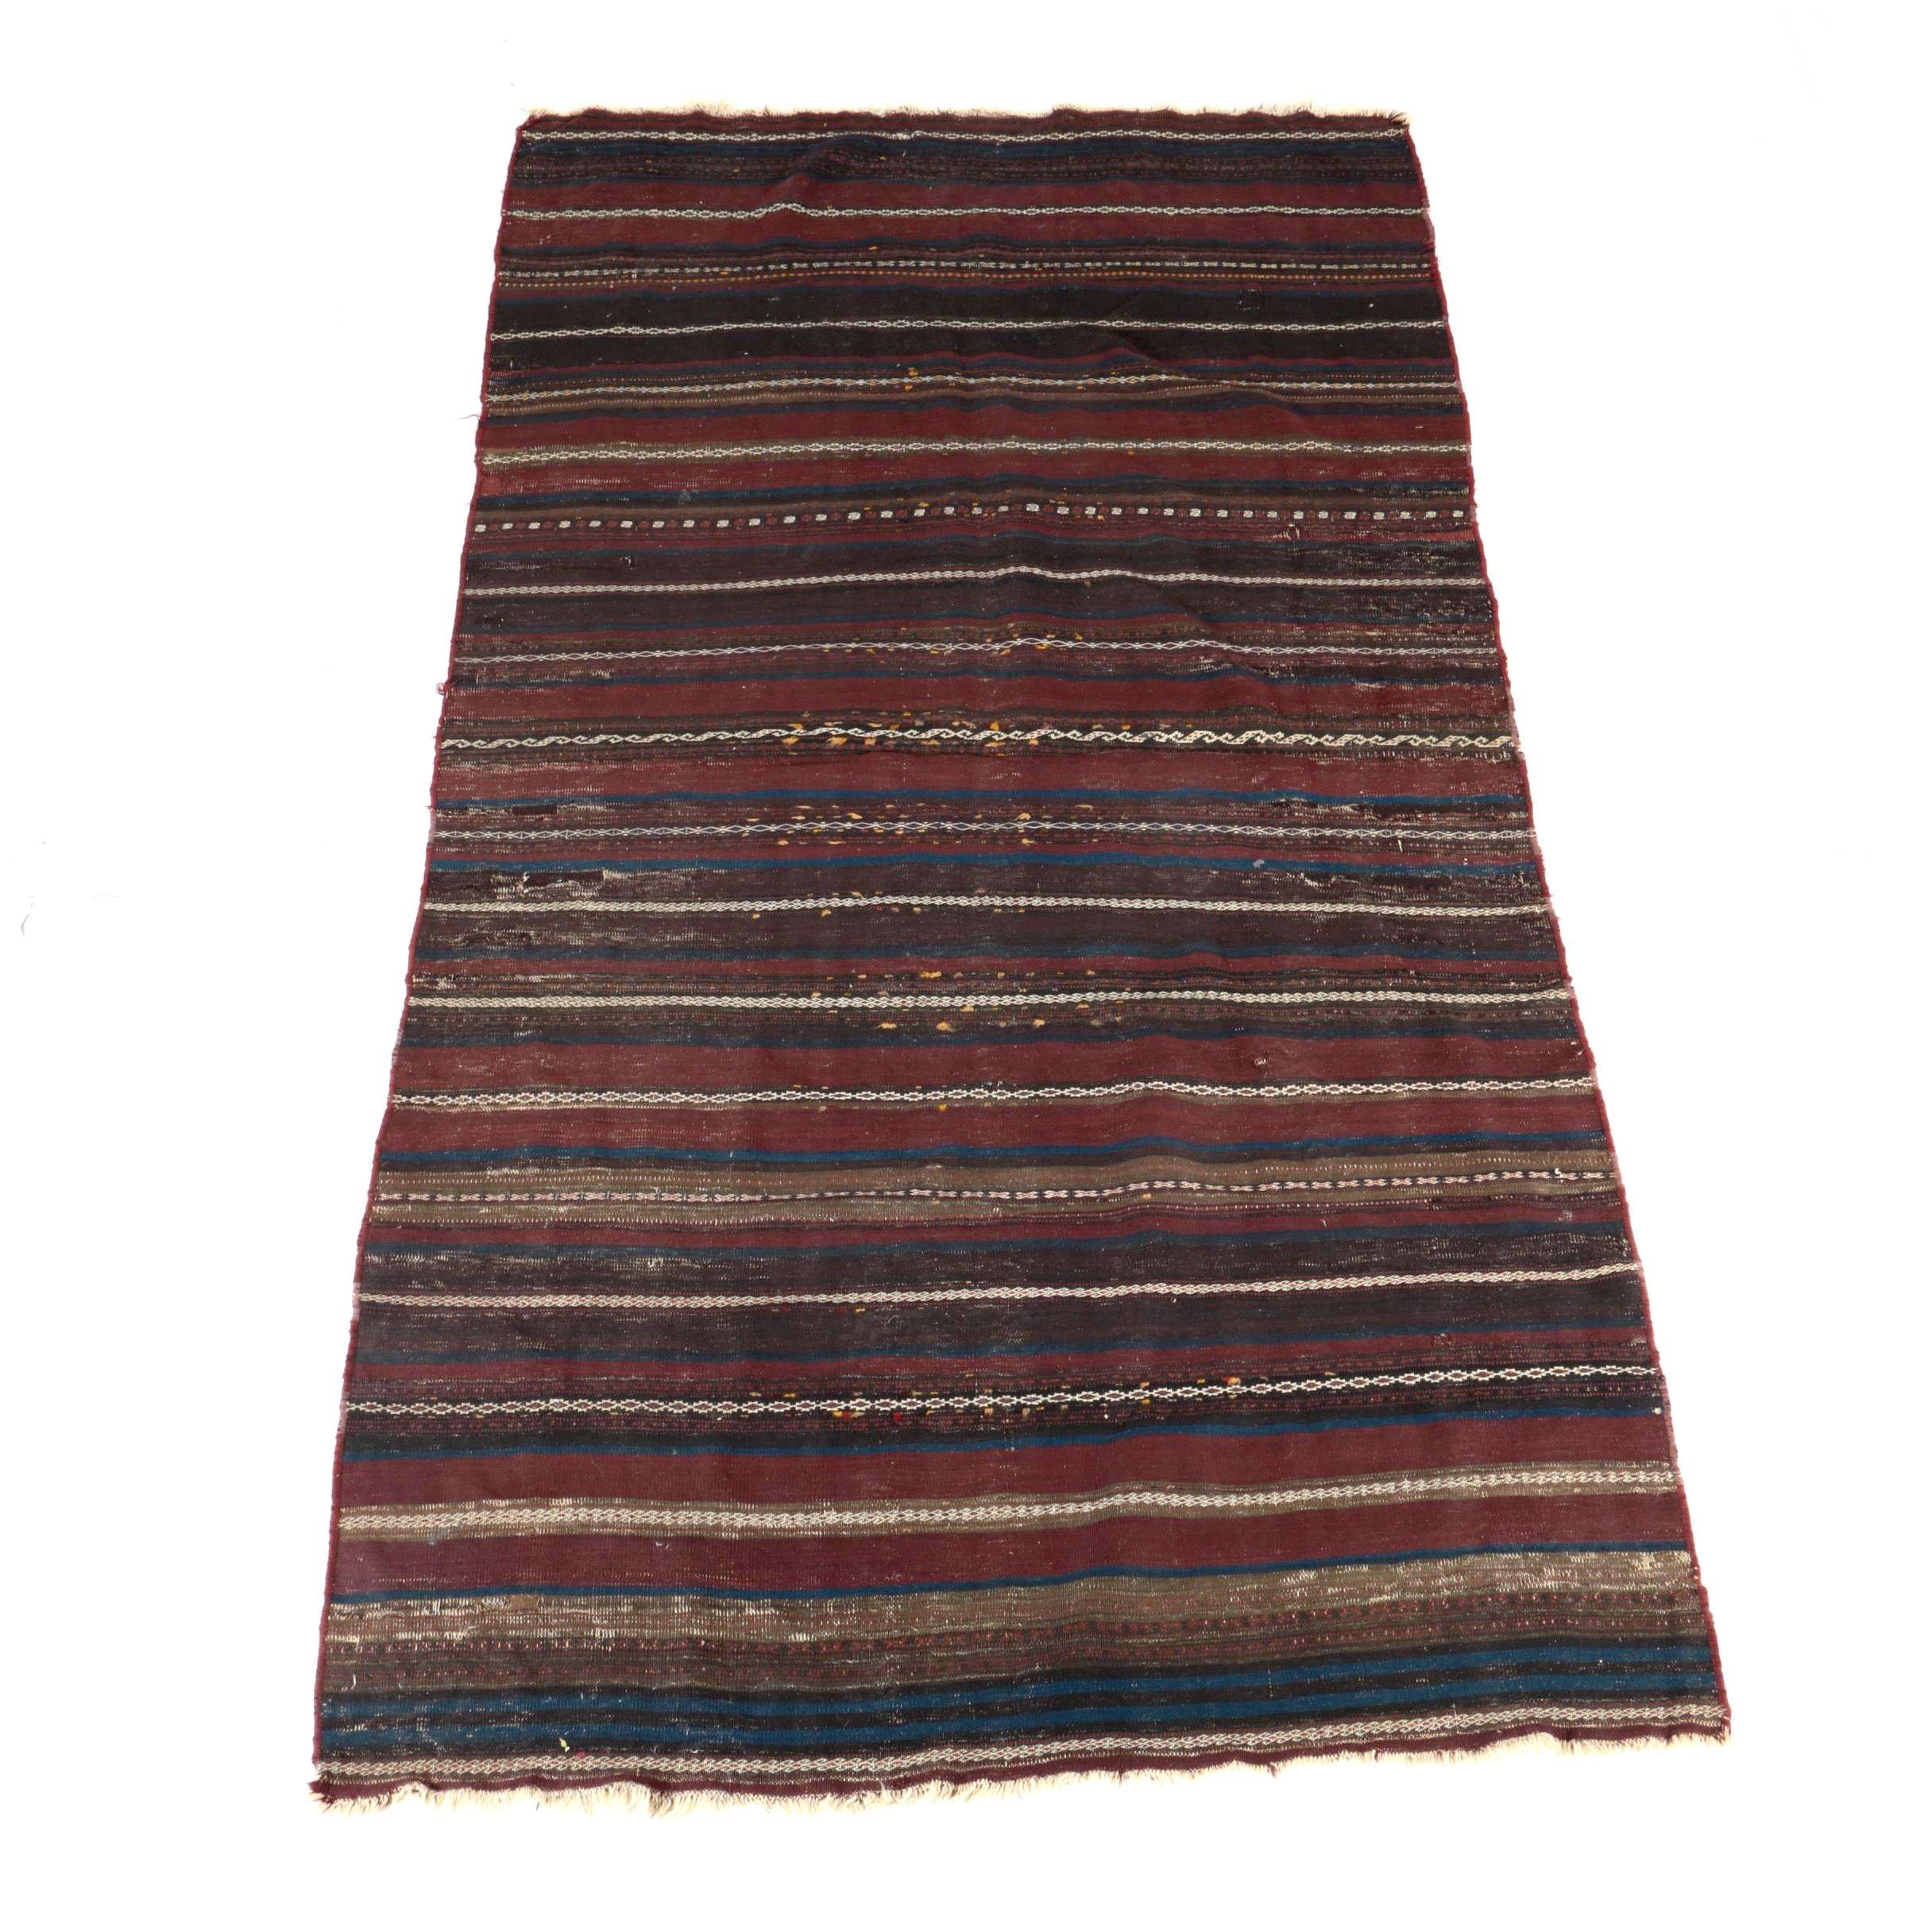 Semi-Antique Handwoven North African Area Rug